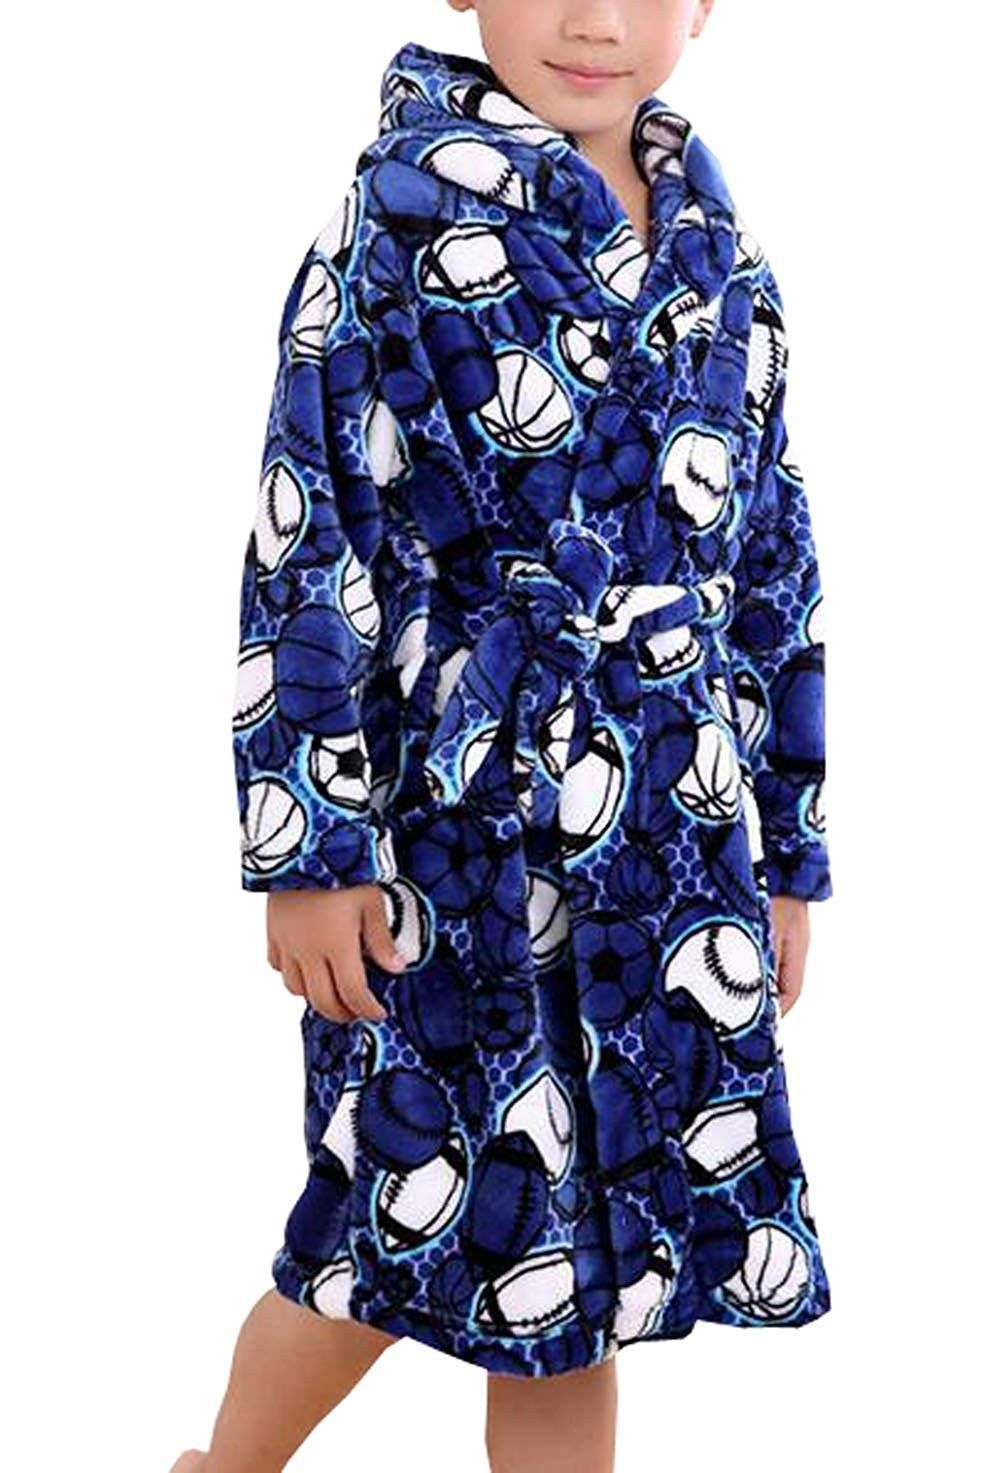 Suplove Boys Flannel Children's Robe Coral Velvet Pajamas Baby Bathrobes -  Blue - CB186T7G30U | Childrens robes, Baby bath robe, Clothes